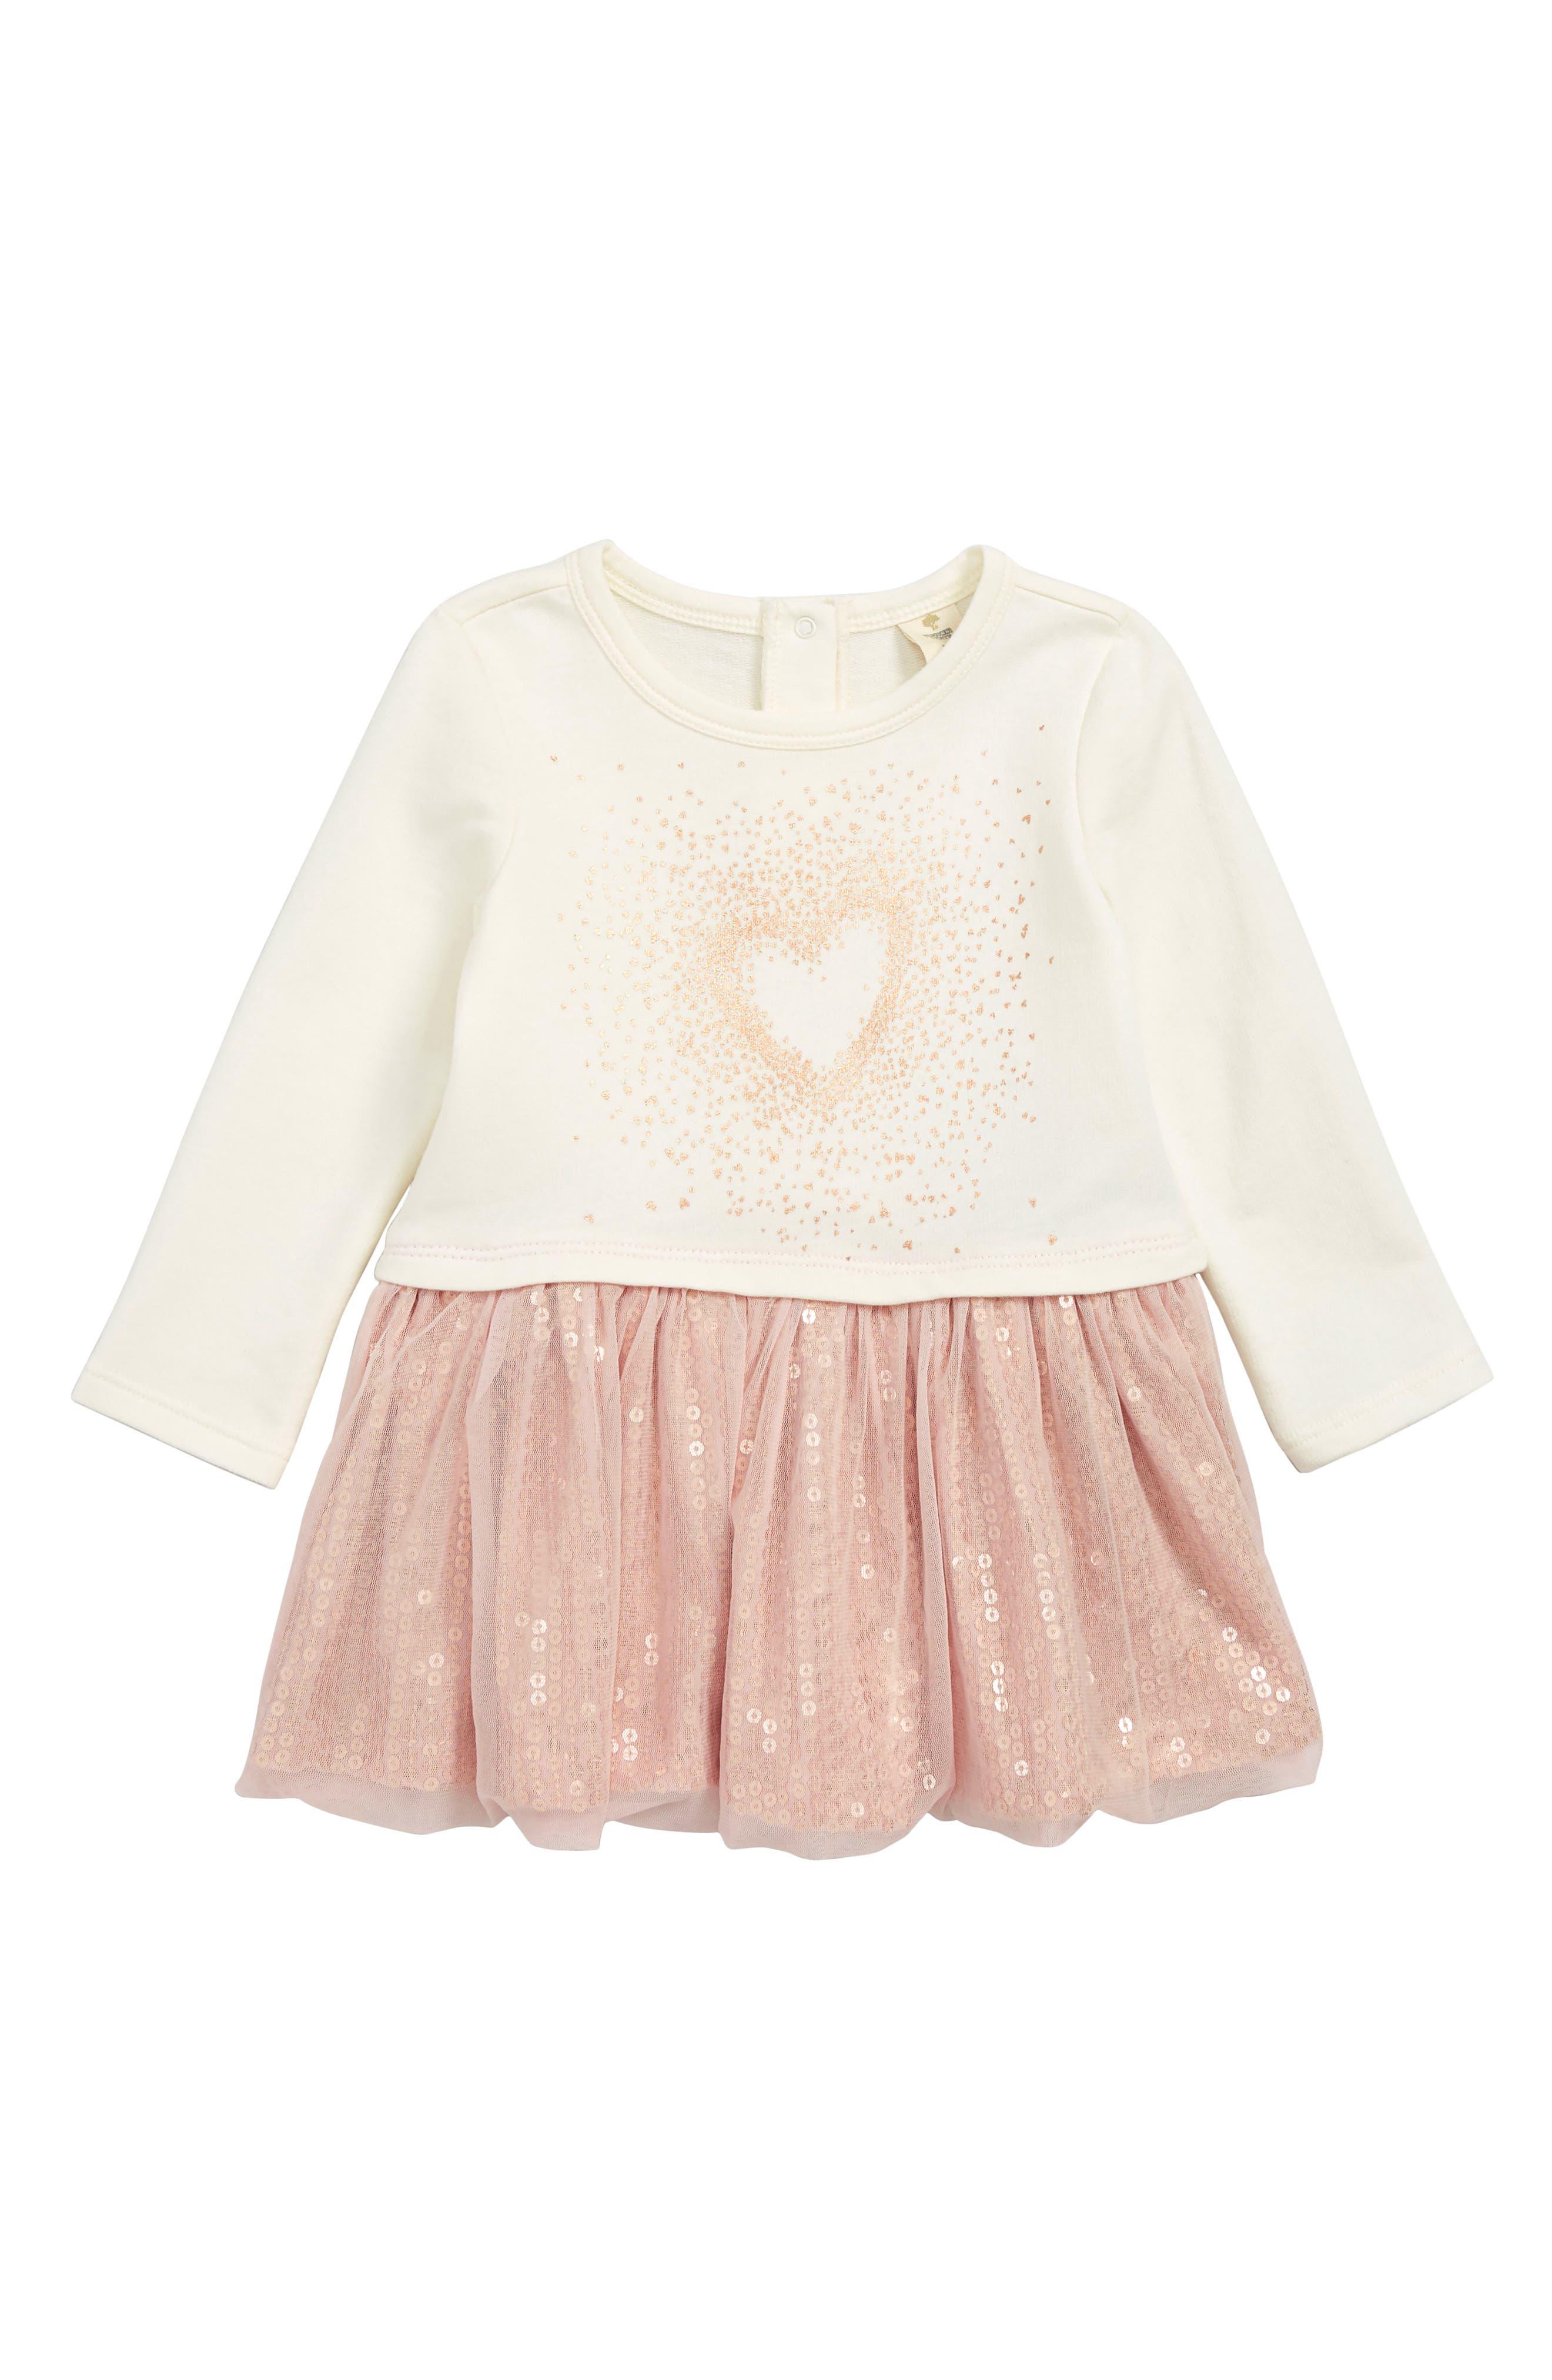 TUCKER + TATE Sequin Tutu Dress, Main, color, IVORY EGRET- PINK HEART